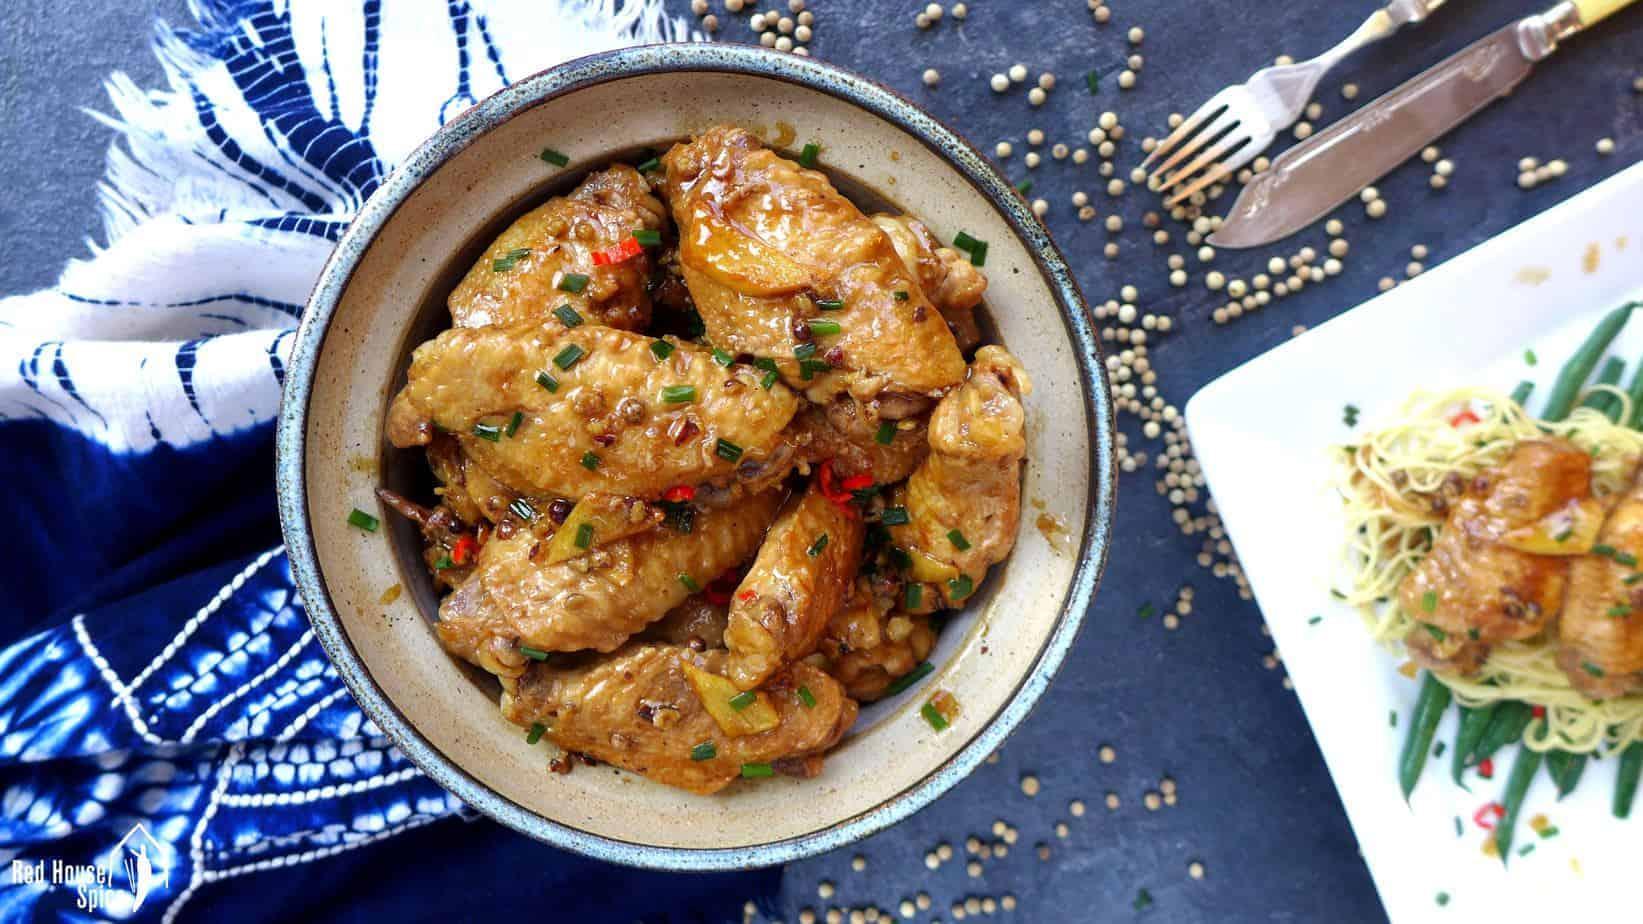 Fuss-free braised chicken wings